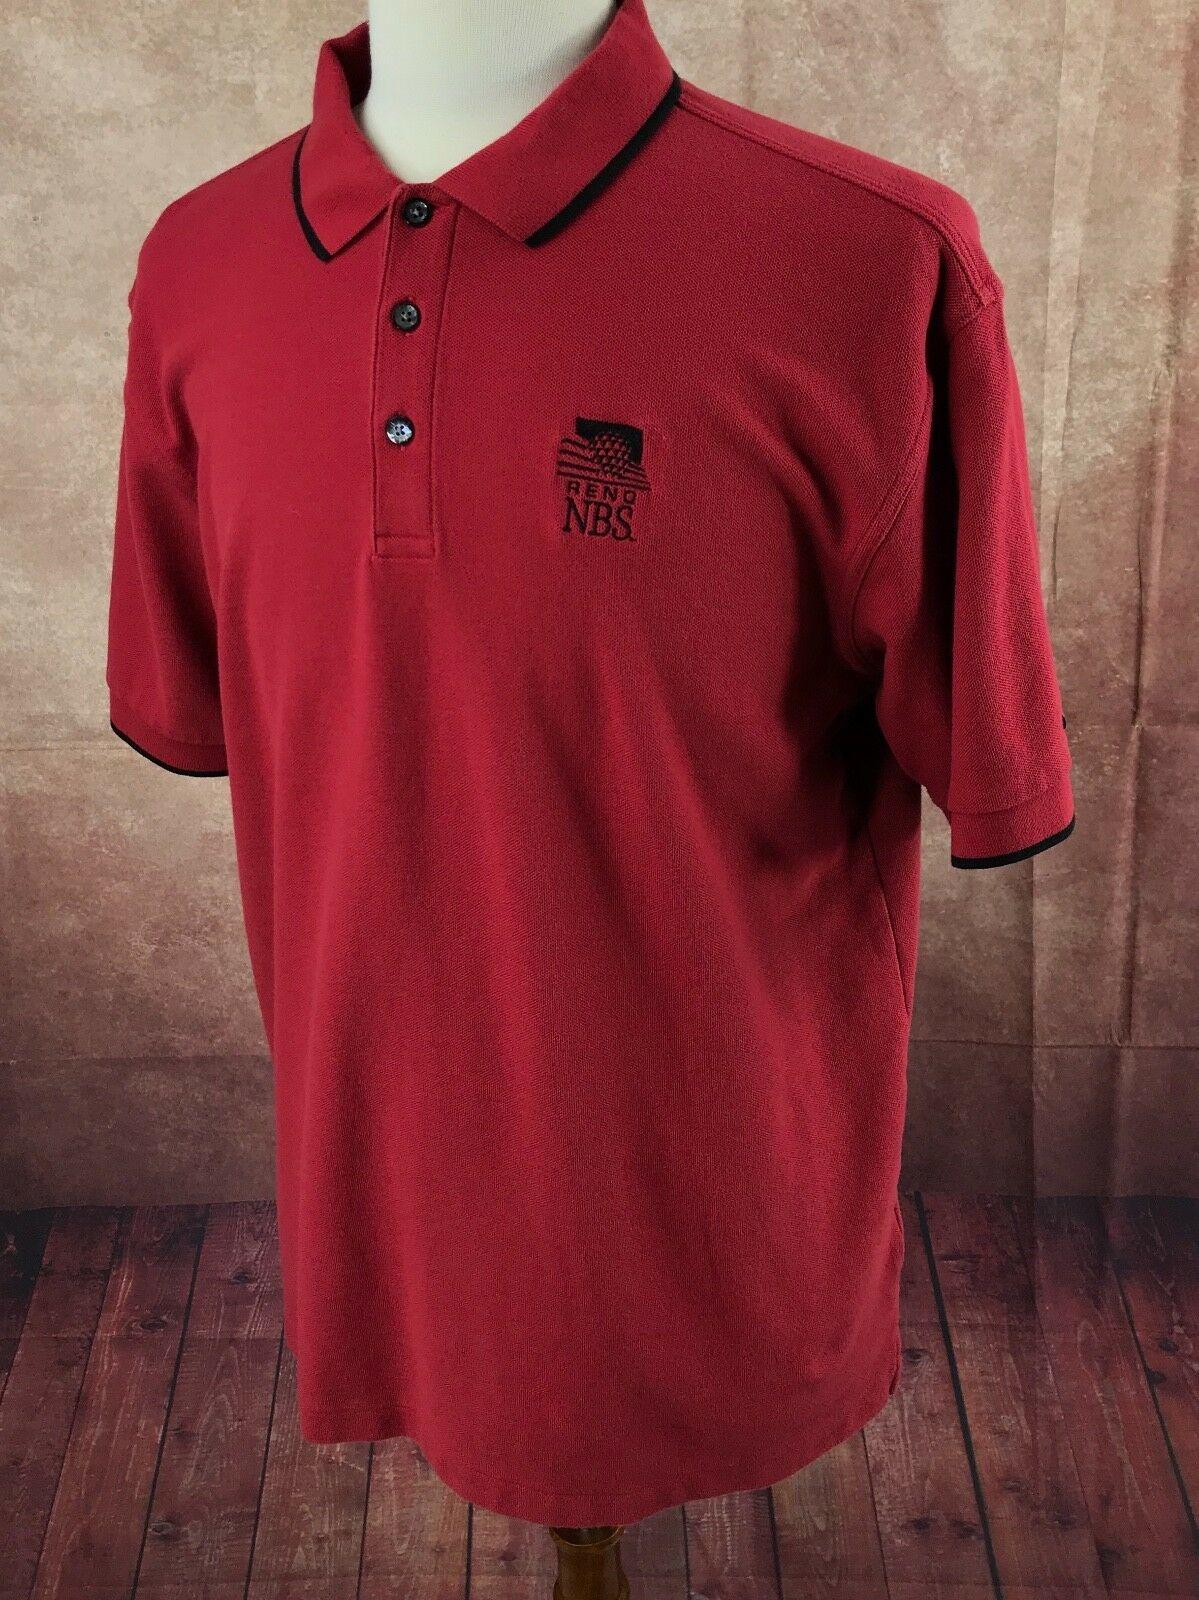 83e4e014 Nike Golf Short Sleeve Reno NBS National and 50 similar items. 57